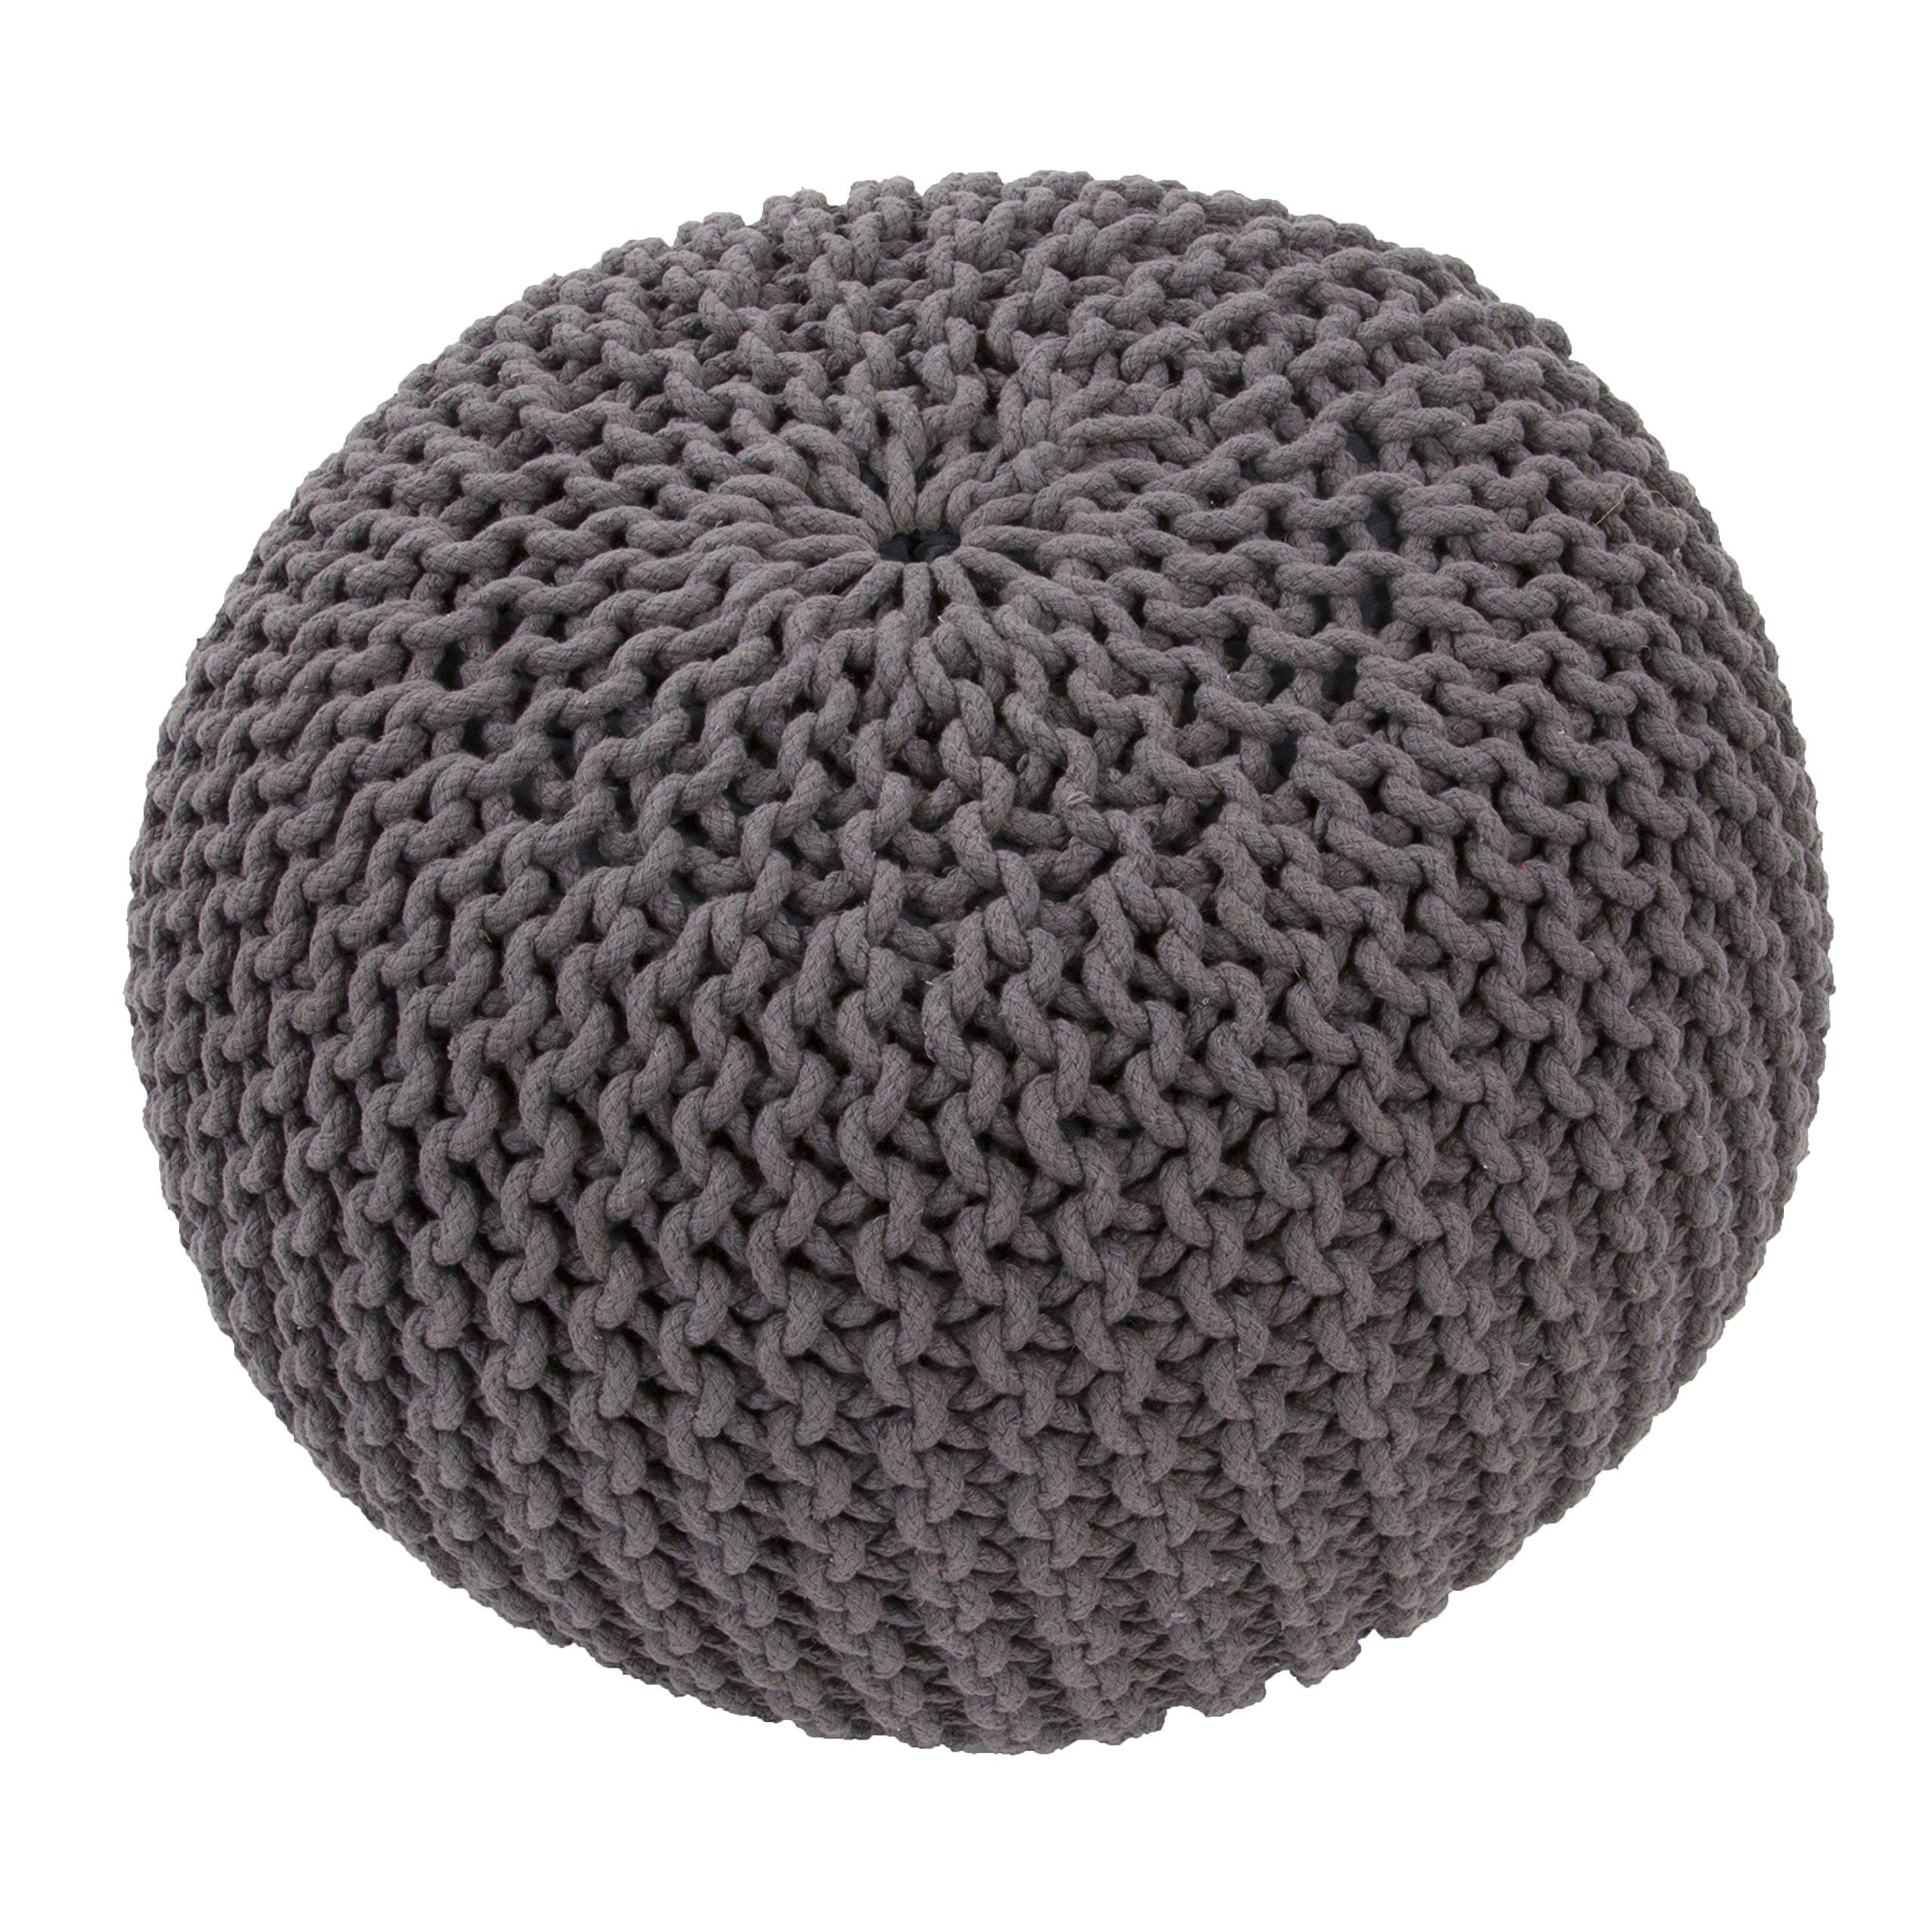 Jaipur Solid Pattern Gray Cotton Pouf, 20-Inch x 20-Inch x 14-Inch, Steele Spectrum